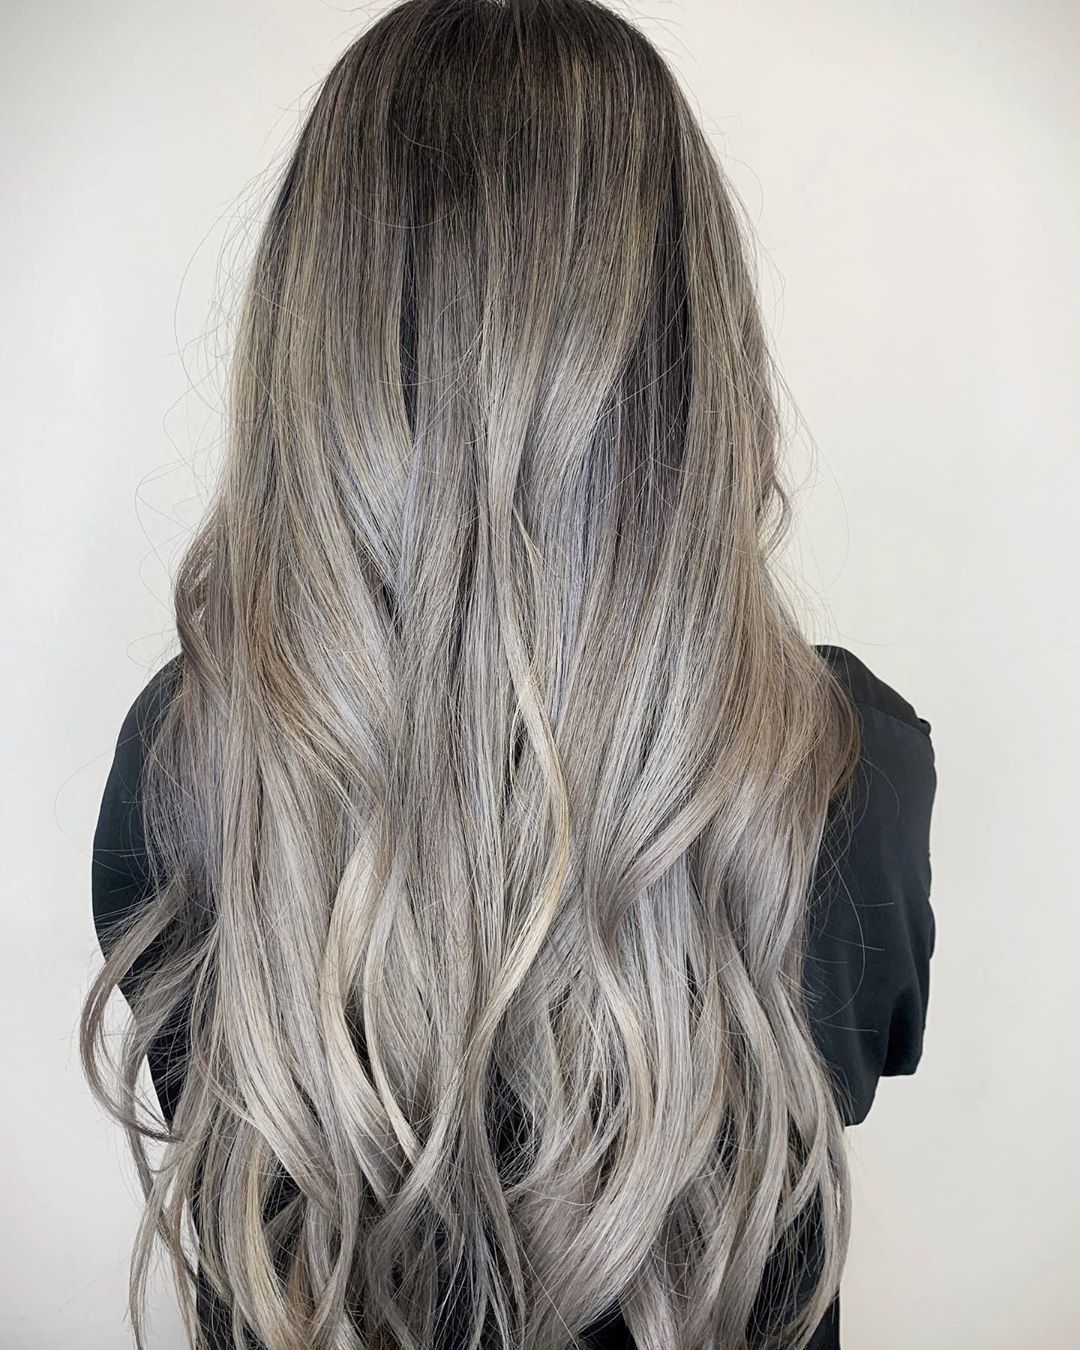 Ash blonde with a dash of smoke ???? . . .  #aishakay #aishakayhair #aishakaystudio #hair #beautiful #pretty #longhair #transformation #ashhair #blondeombre #ashblonde #ashblondebalayage  #prettyhair #beachwaves #lighthair #asianblondeahie #greyhair #graybalayage #blondeondarkhair #balayageombre  #sgvhair #glendalehair #lahair #pasadenahair #schwarzkopf #cosmoprof #behindthechair #modernsalon  #americansalon #hairspiration #lightashblonde Ash blonde with a dash of smoke ???? . . .  #aishakay #ai #ashblondebalayage